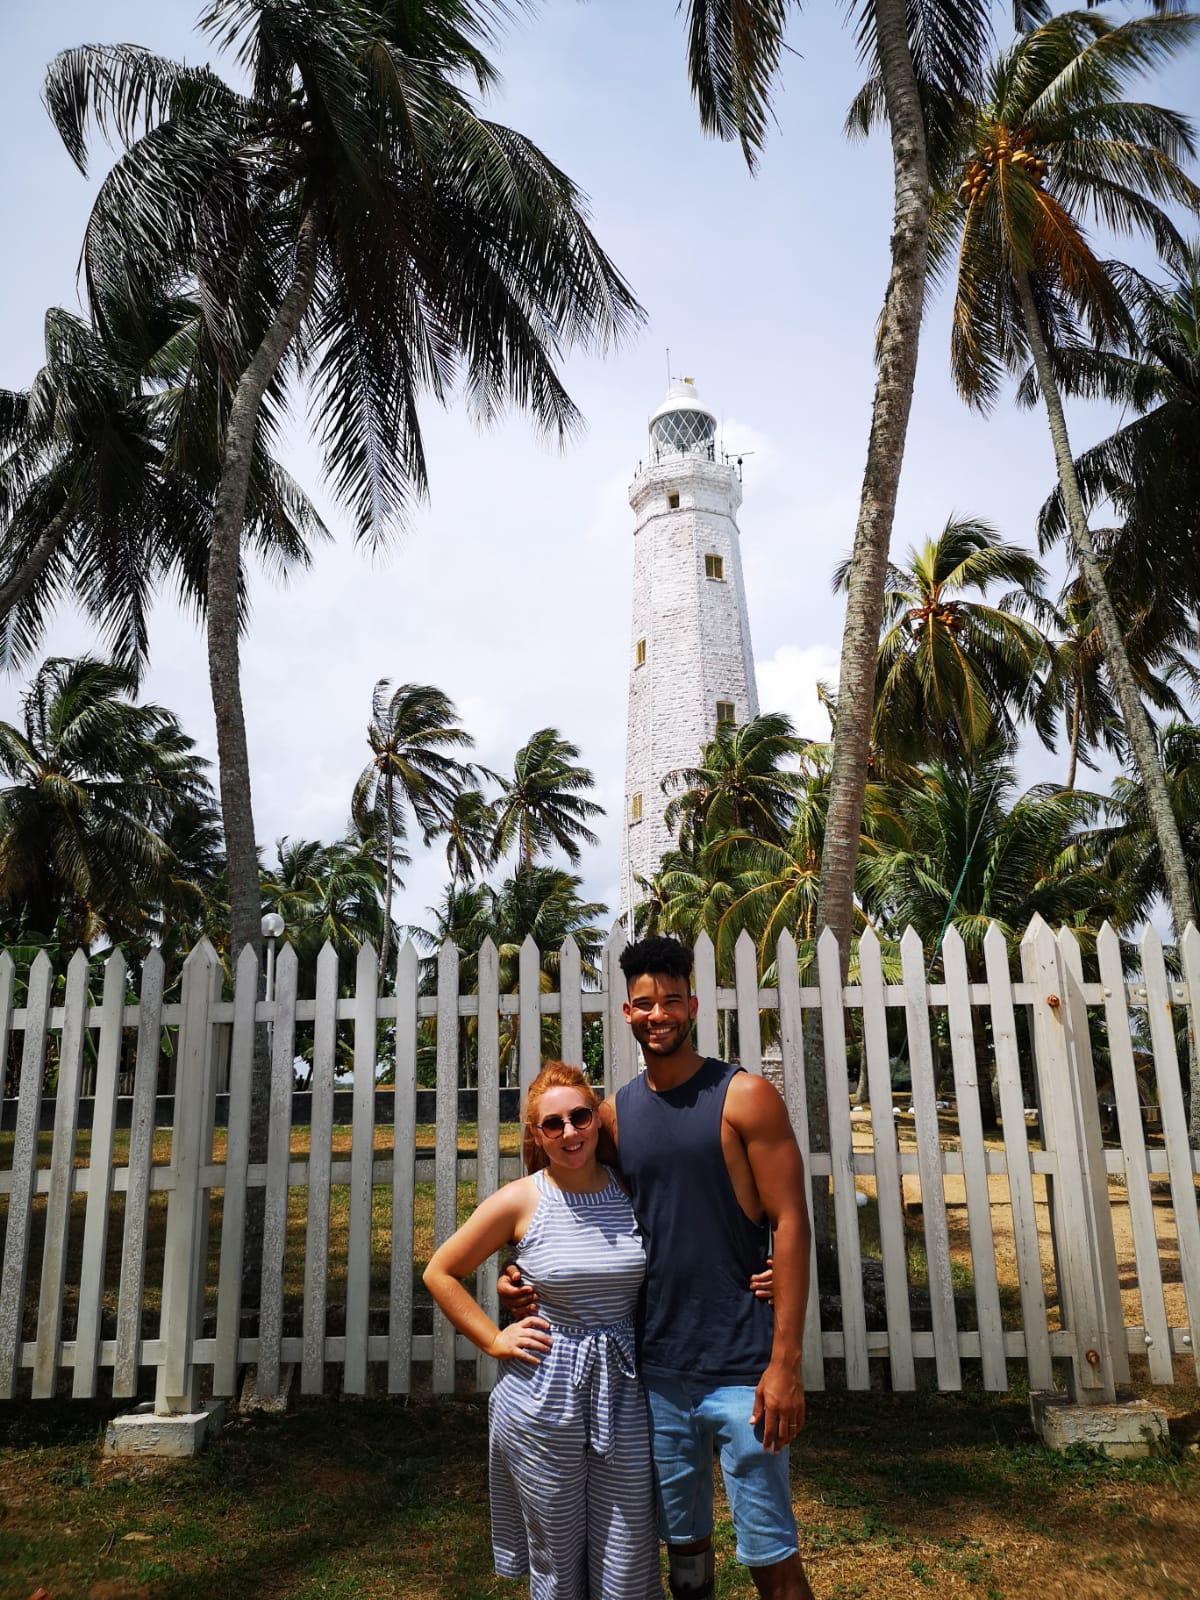 invite-to-paradise-sri-lanka-holiday-honeymoon-specialists-customer-feedback-elin-jordan-luce-galle-lighthouse.JPG